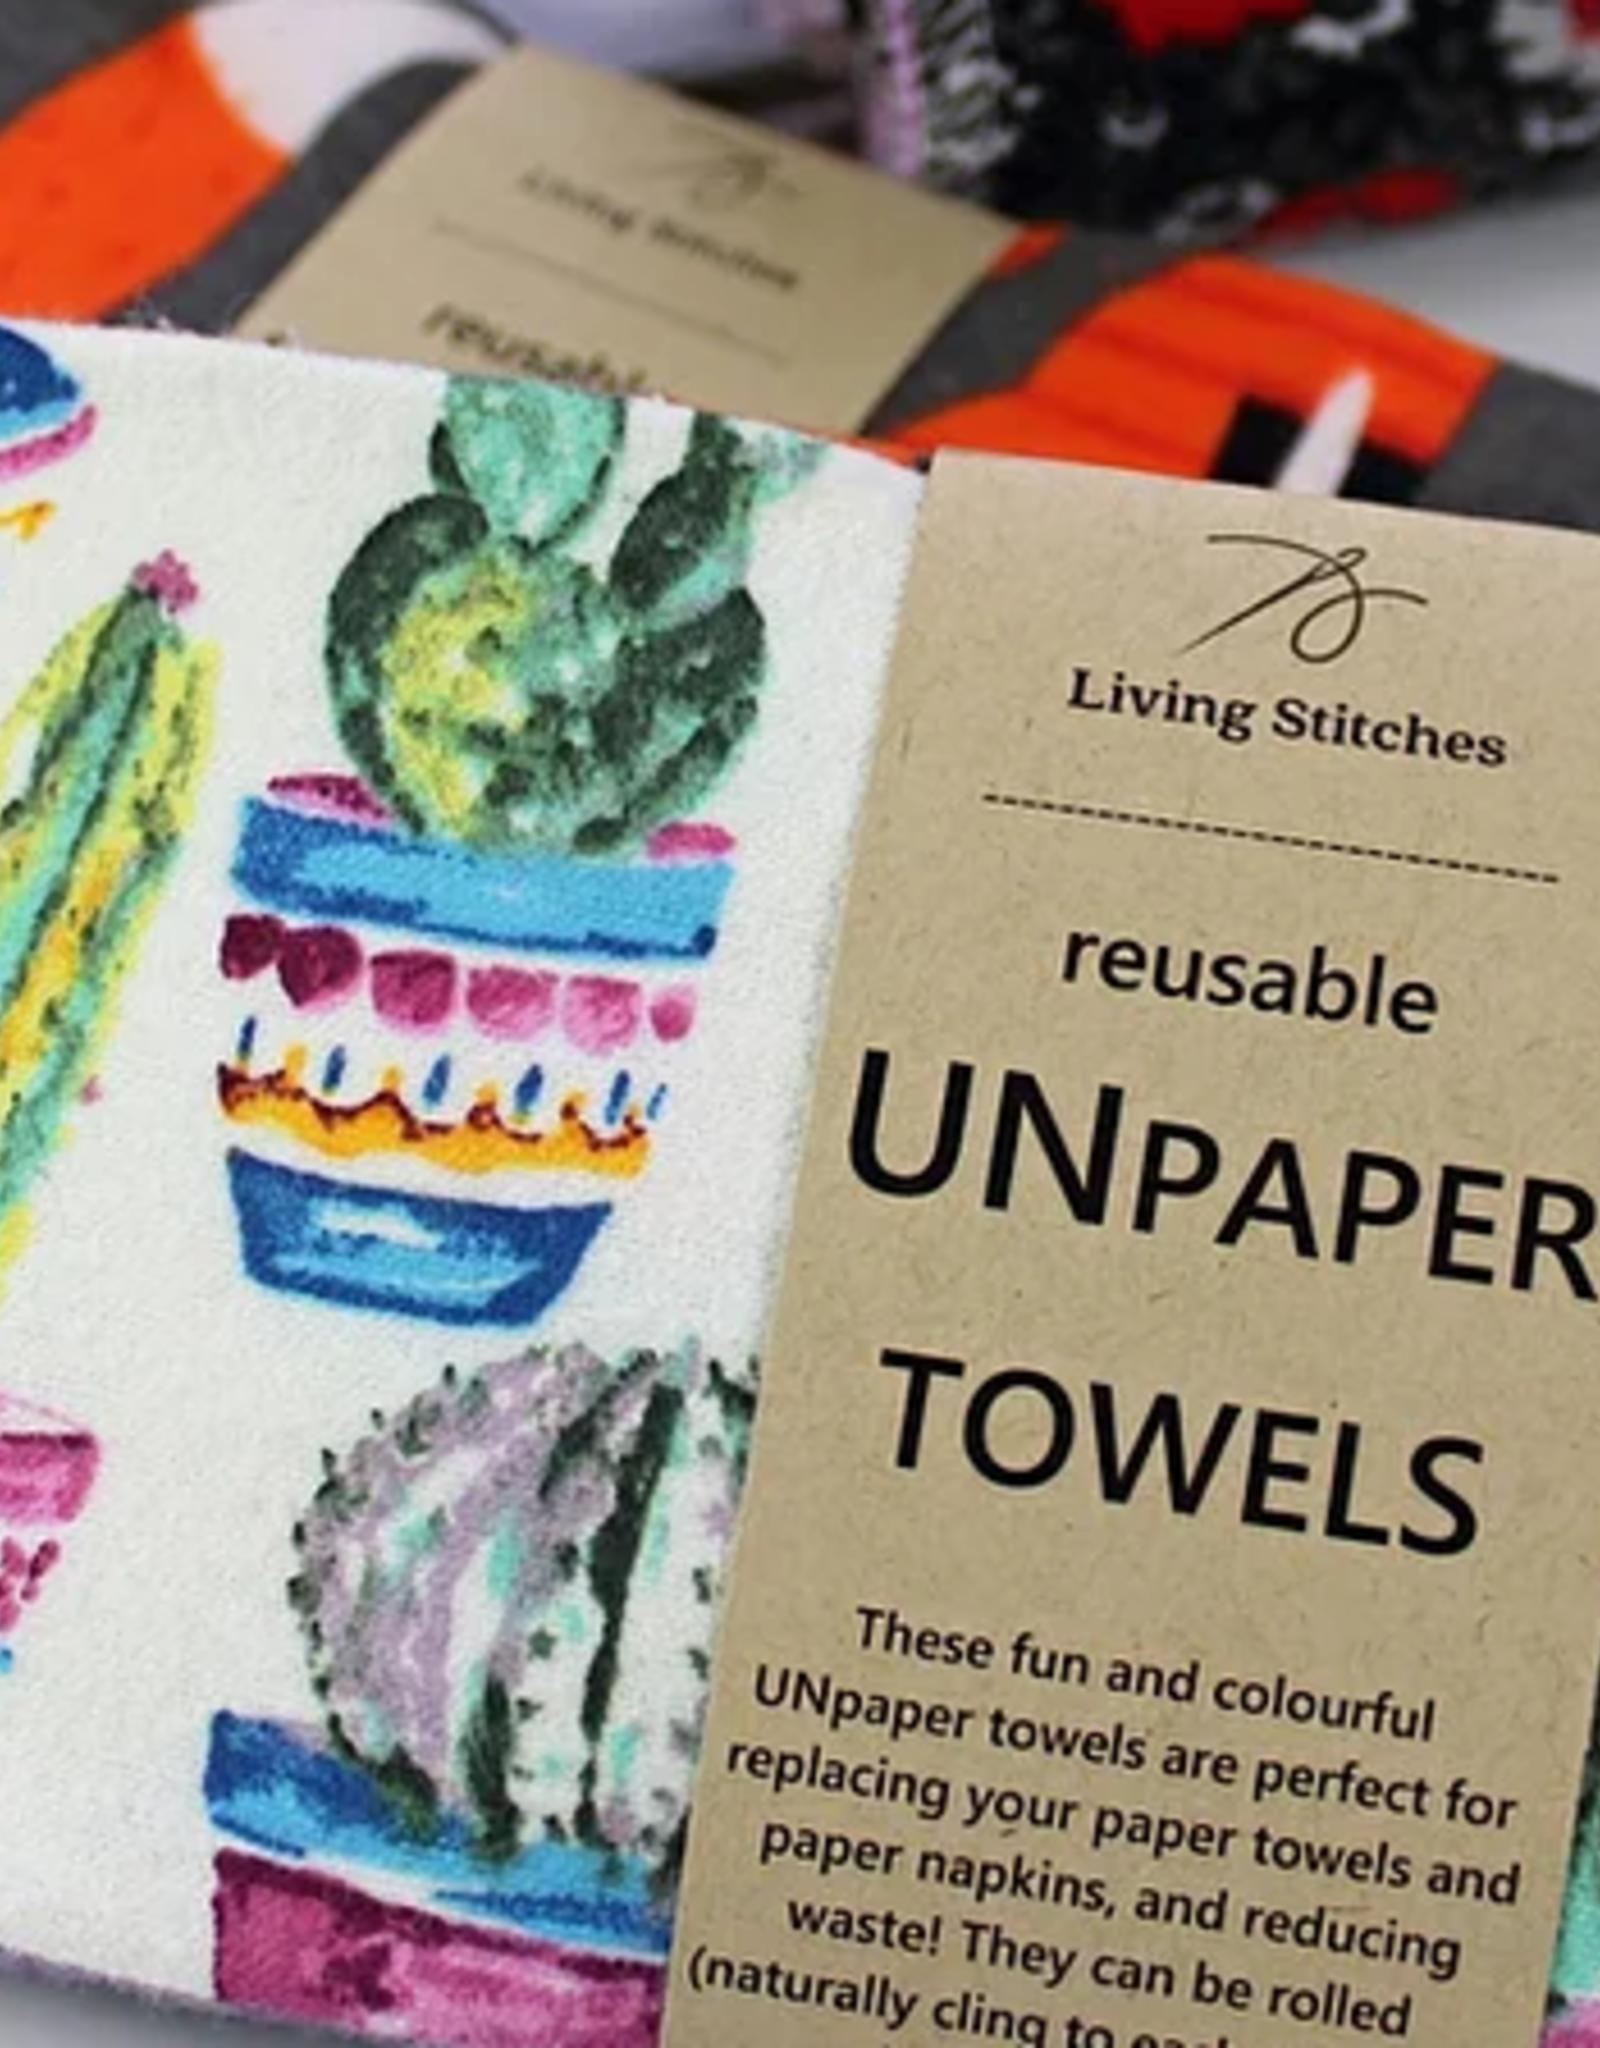 Living Stitches UNpaper Towels